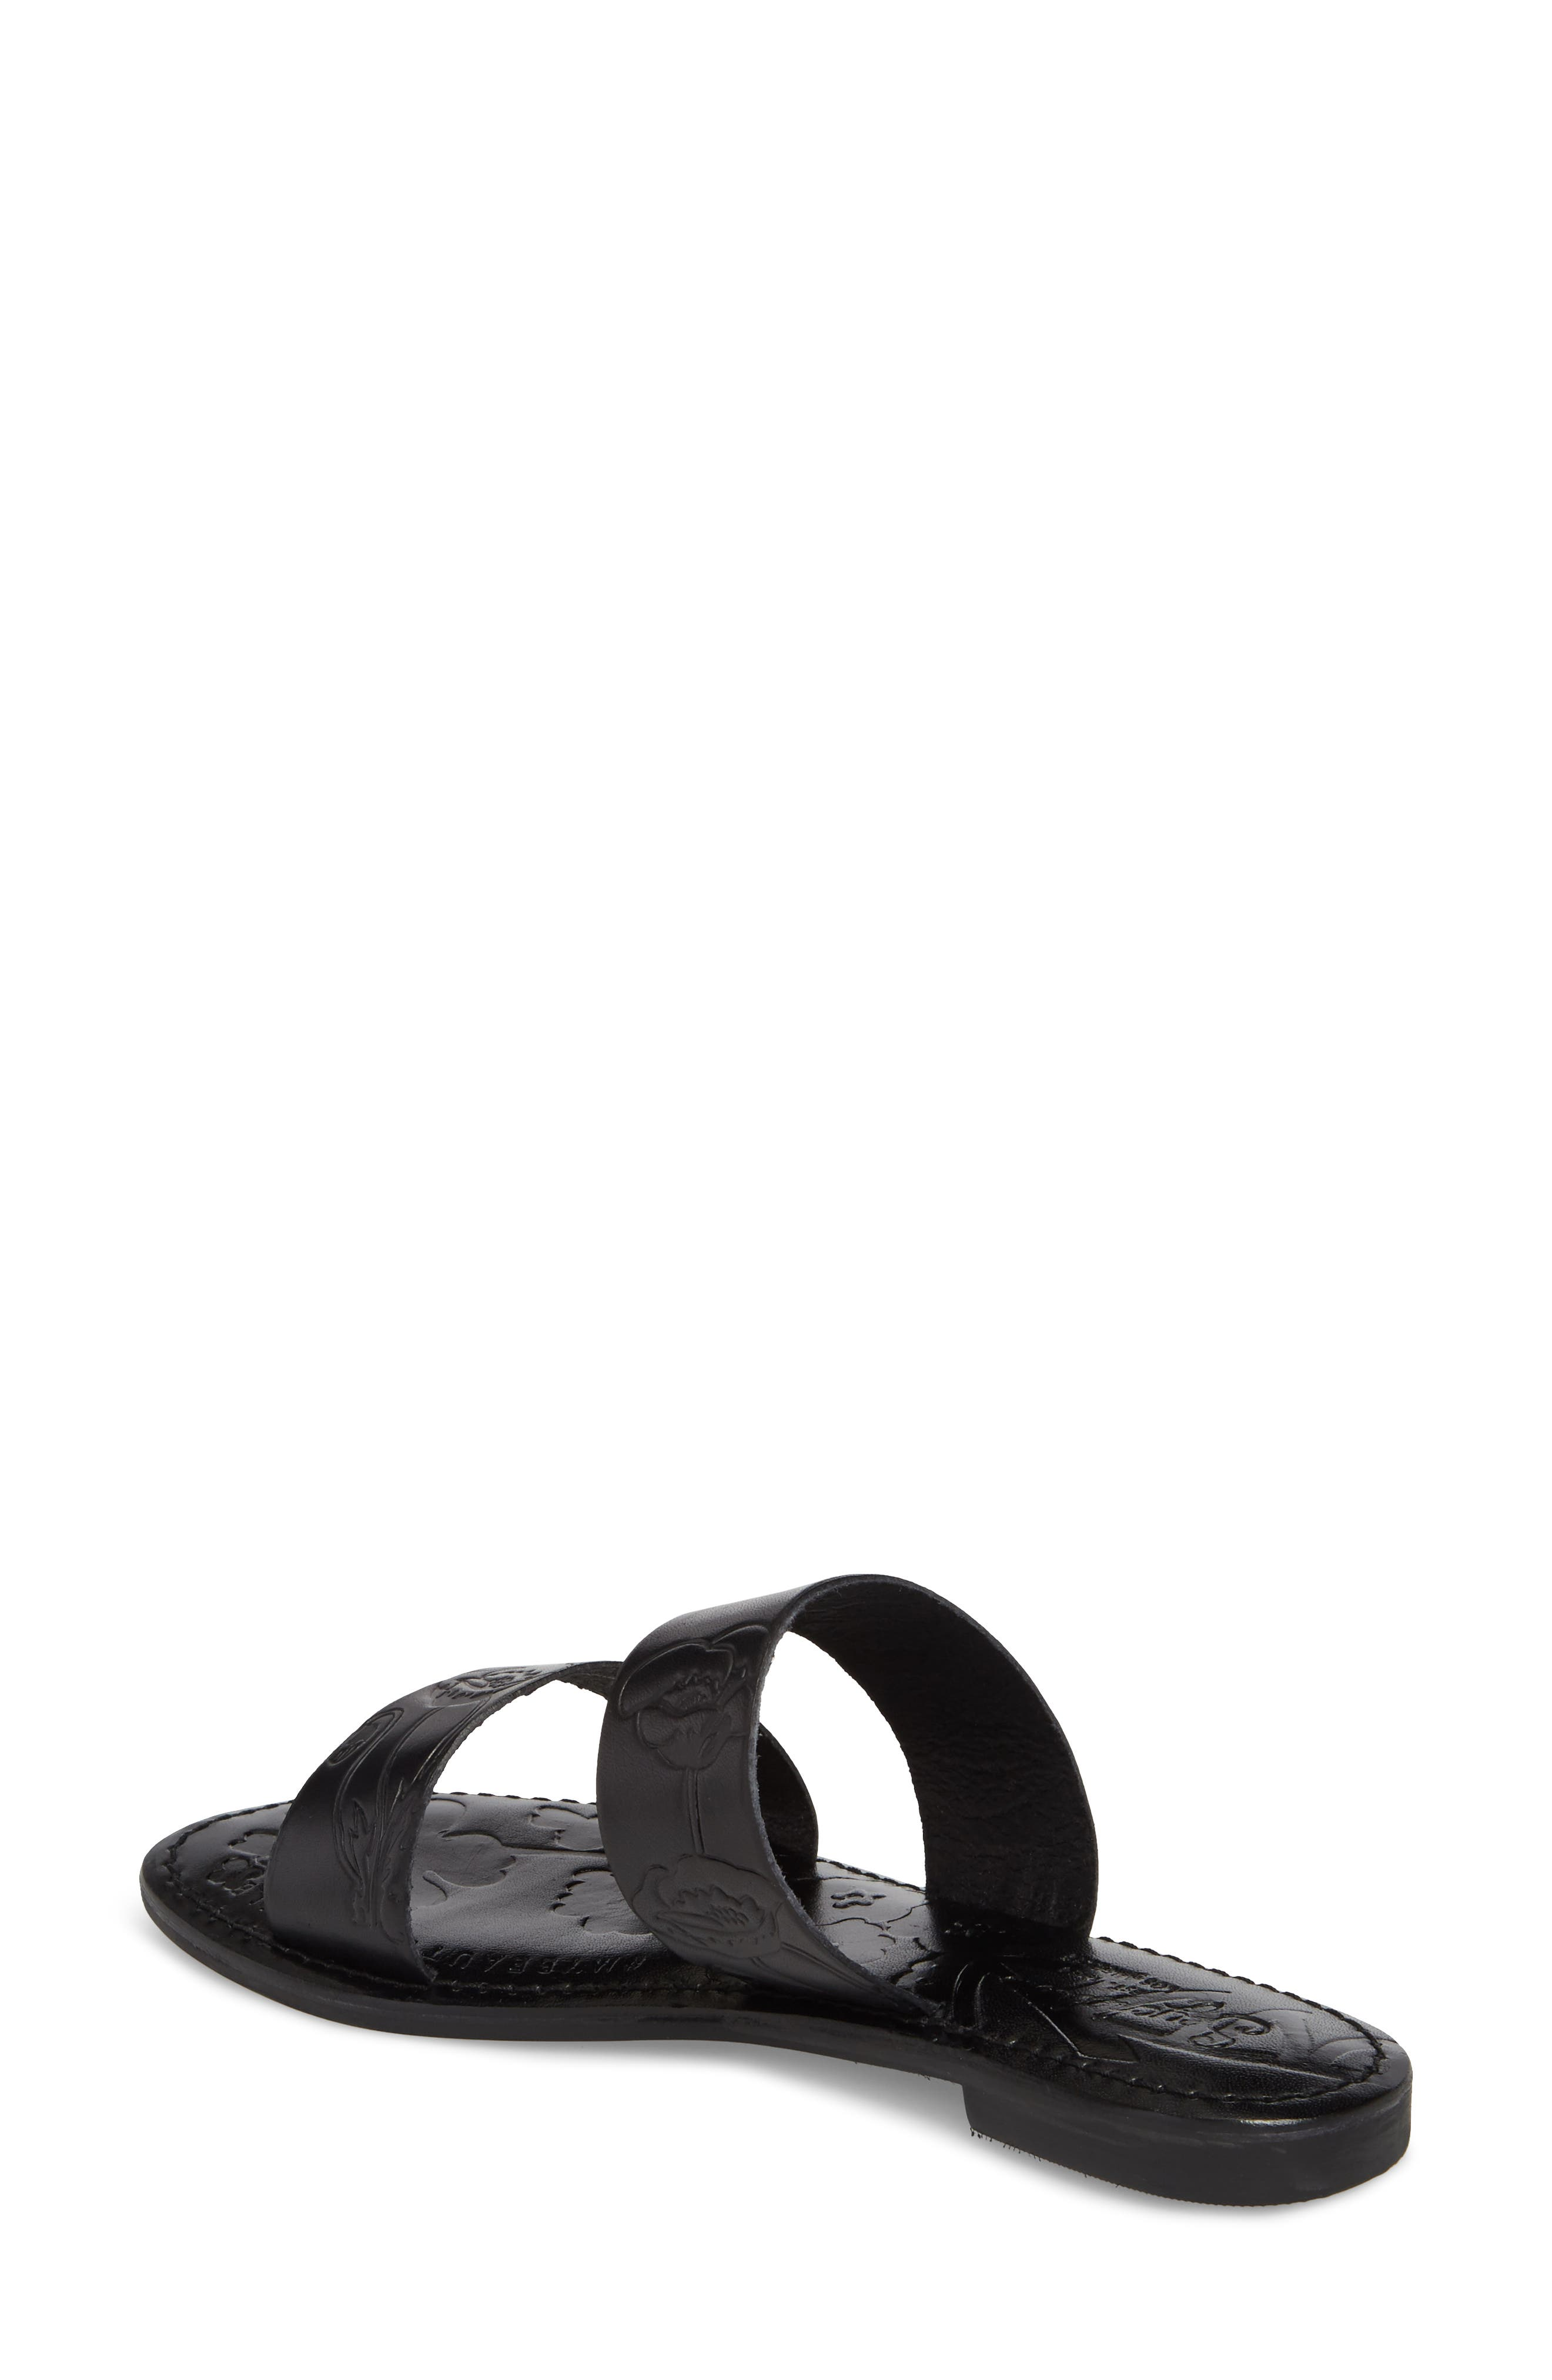 Sheroes Slide Sandal,                             Alternate thumbnail 2, color,                             BLACK LEATHER